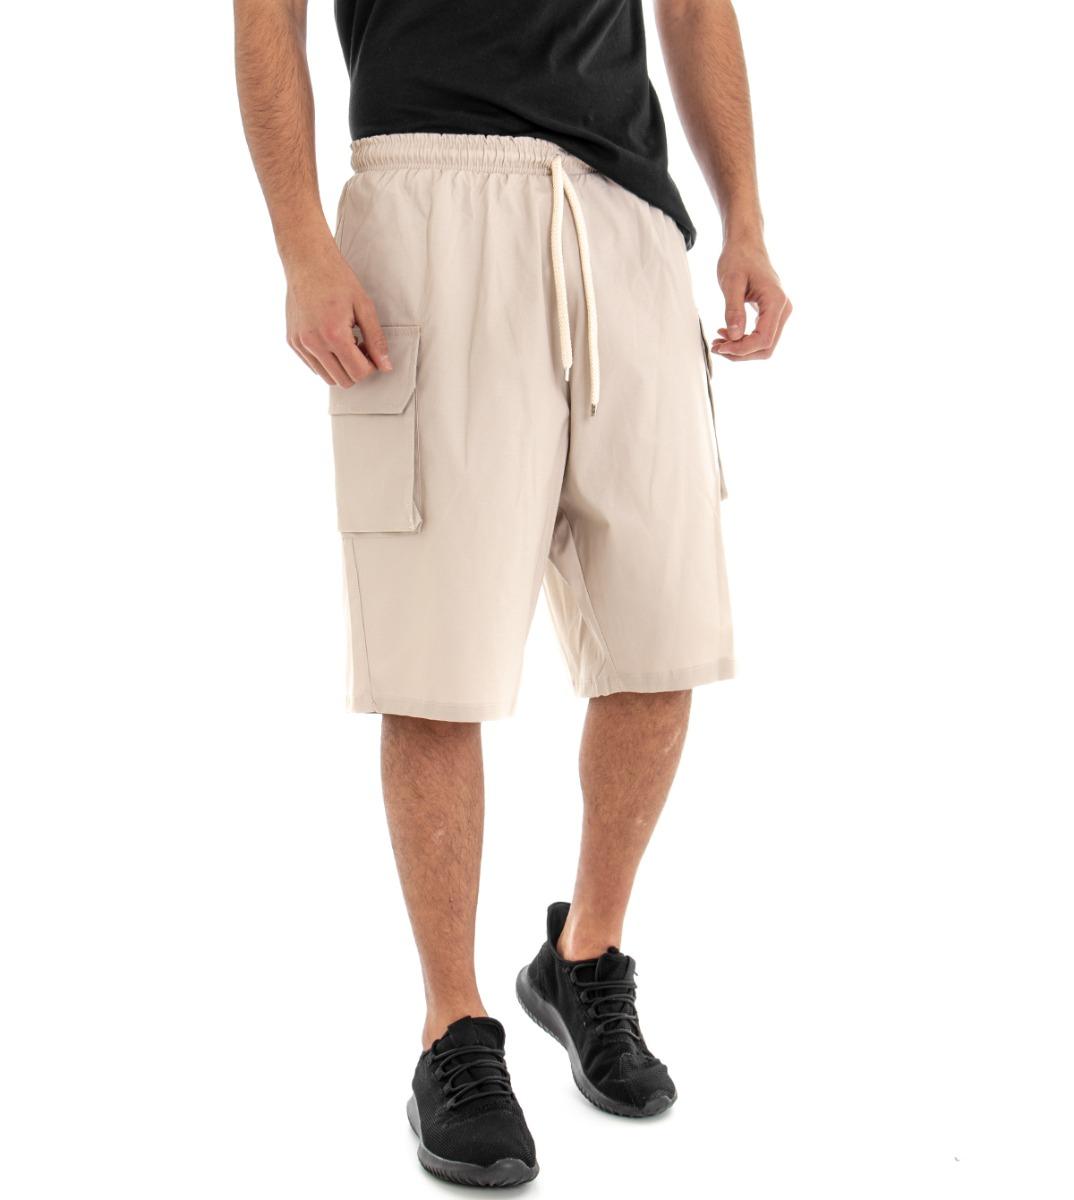 pantaloni donna bermuda lino cotone elastico vari colori estivi